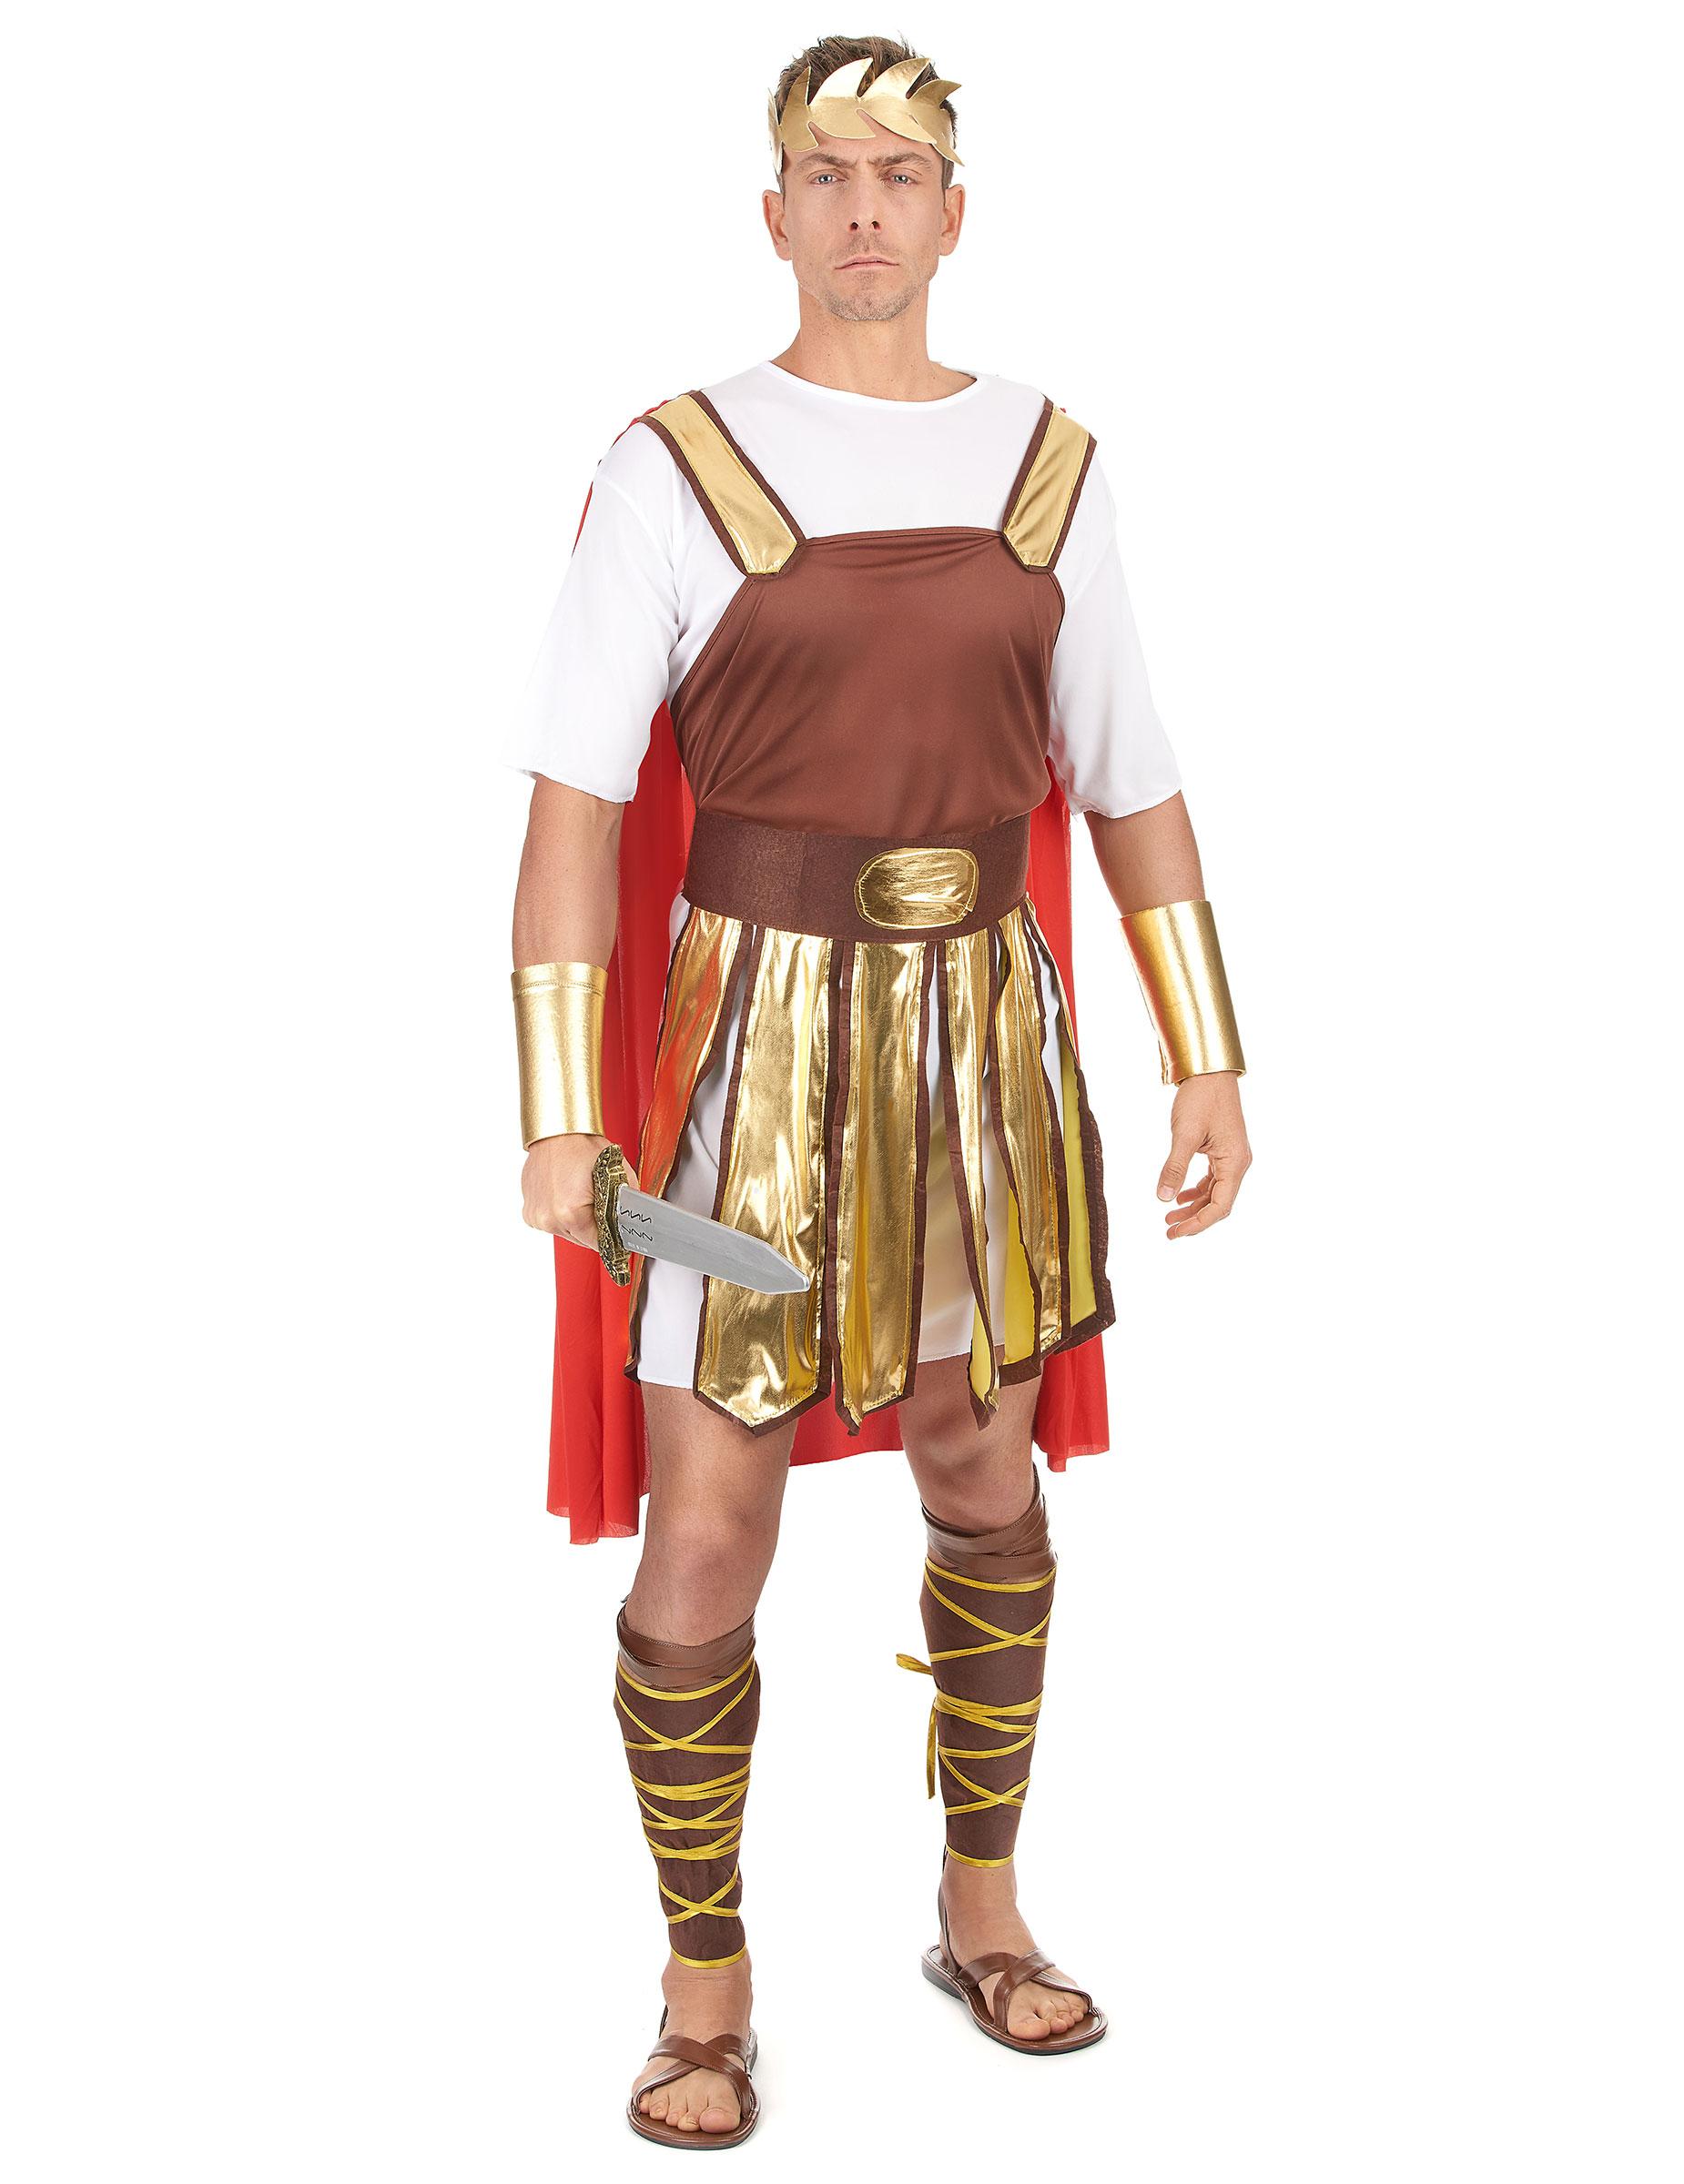 3deaff4ad Fantasia soldado romano: Disfarces Adultos,mascarilhas e fatos de ...